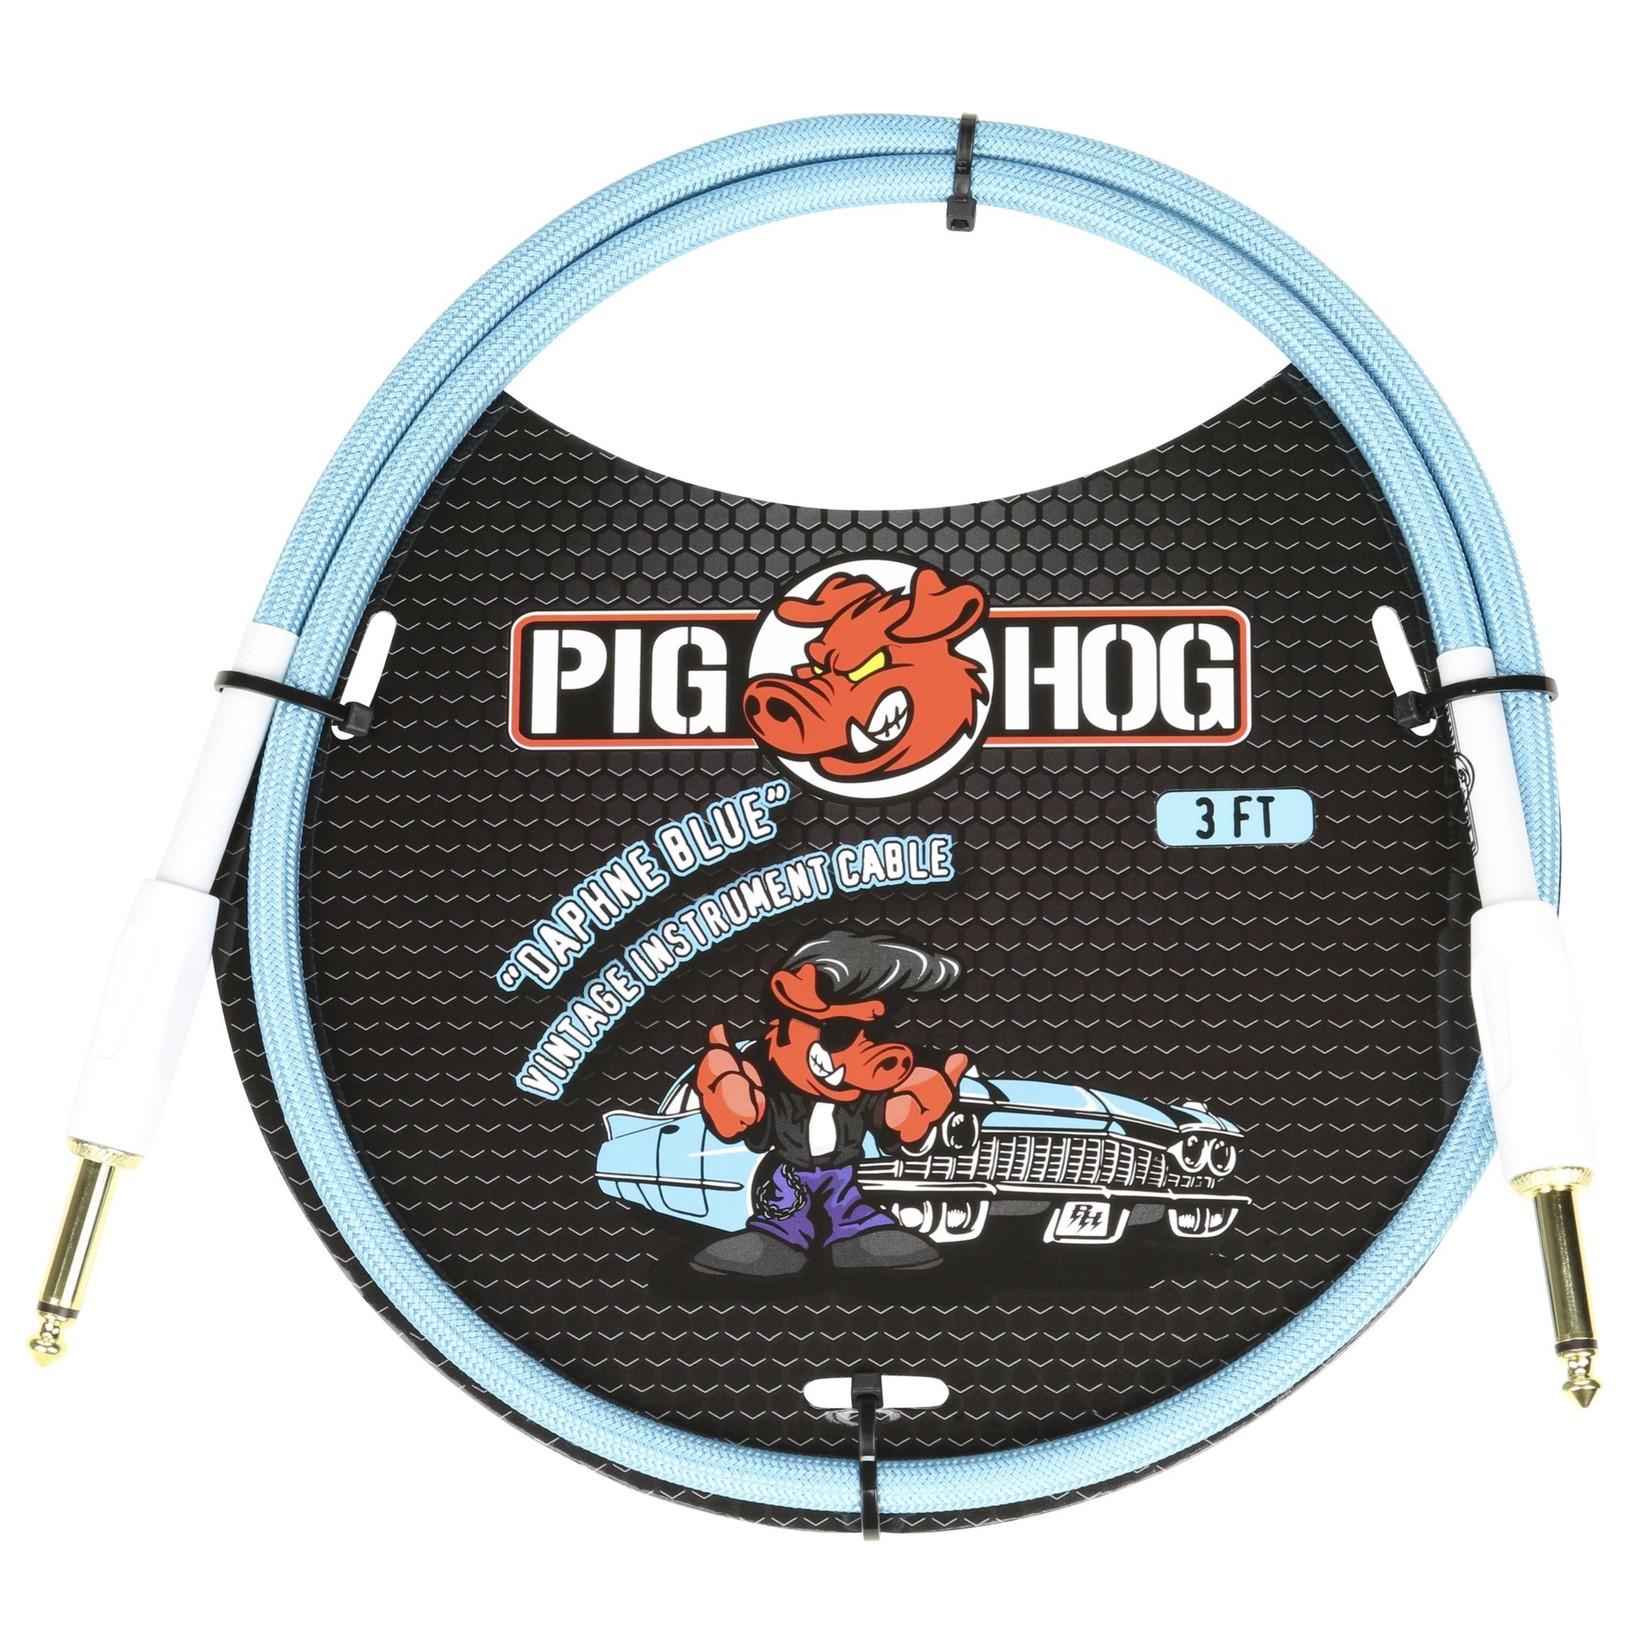 "Pig Hog Pig Hog Vintage Woven Patch Cable, 3-Foot, 7mm, 1/4"" Straight Connectors, ""Daphne Blue"" (PCH3DB)"